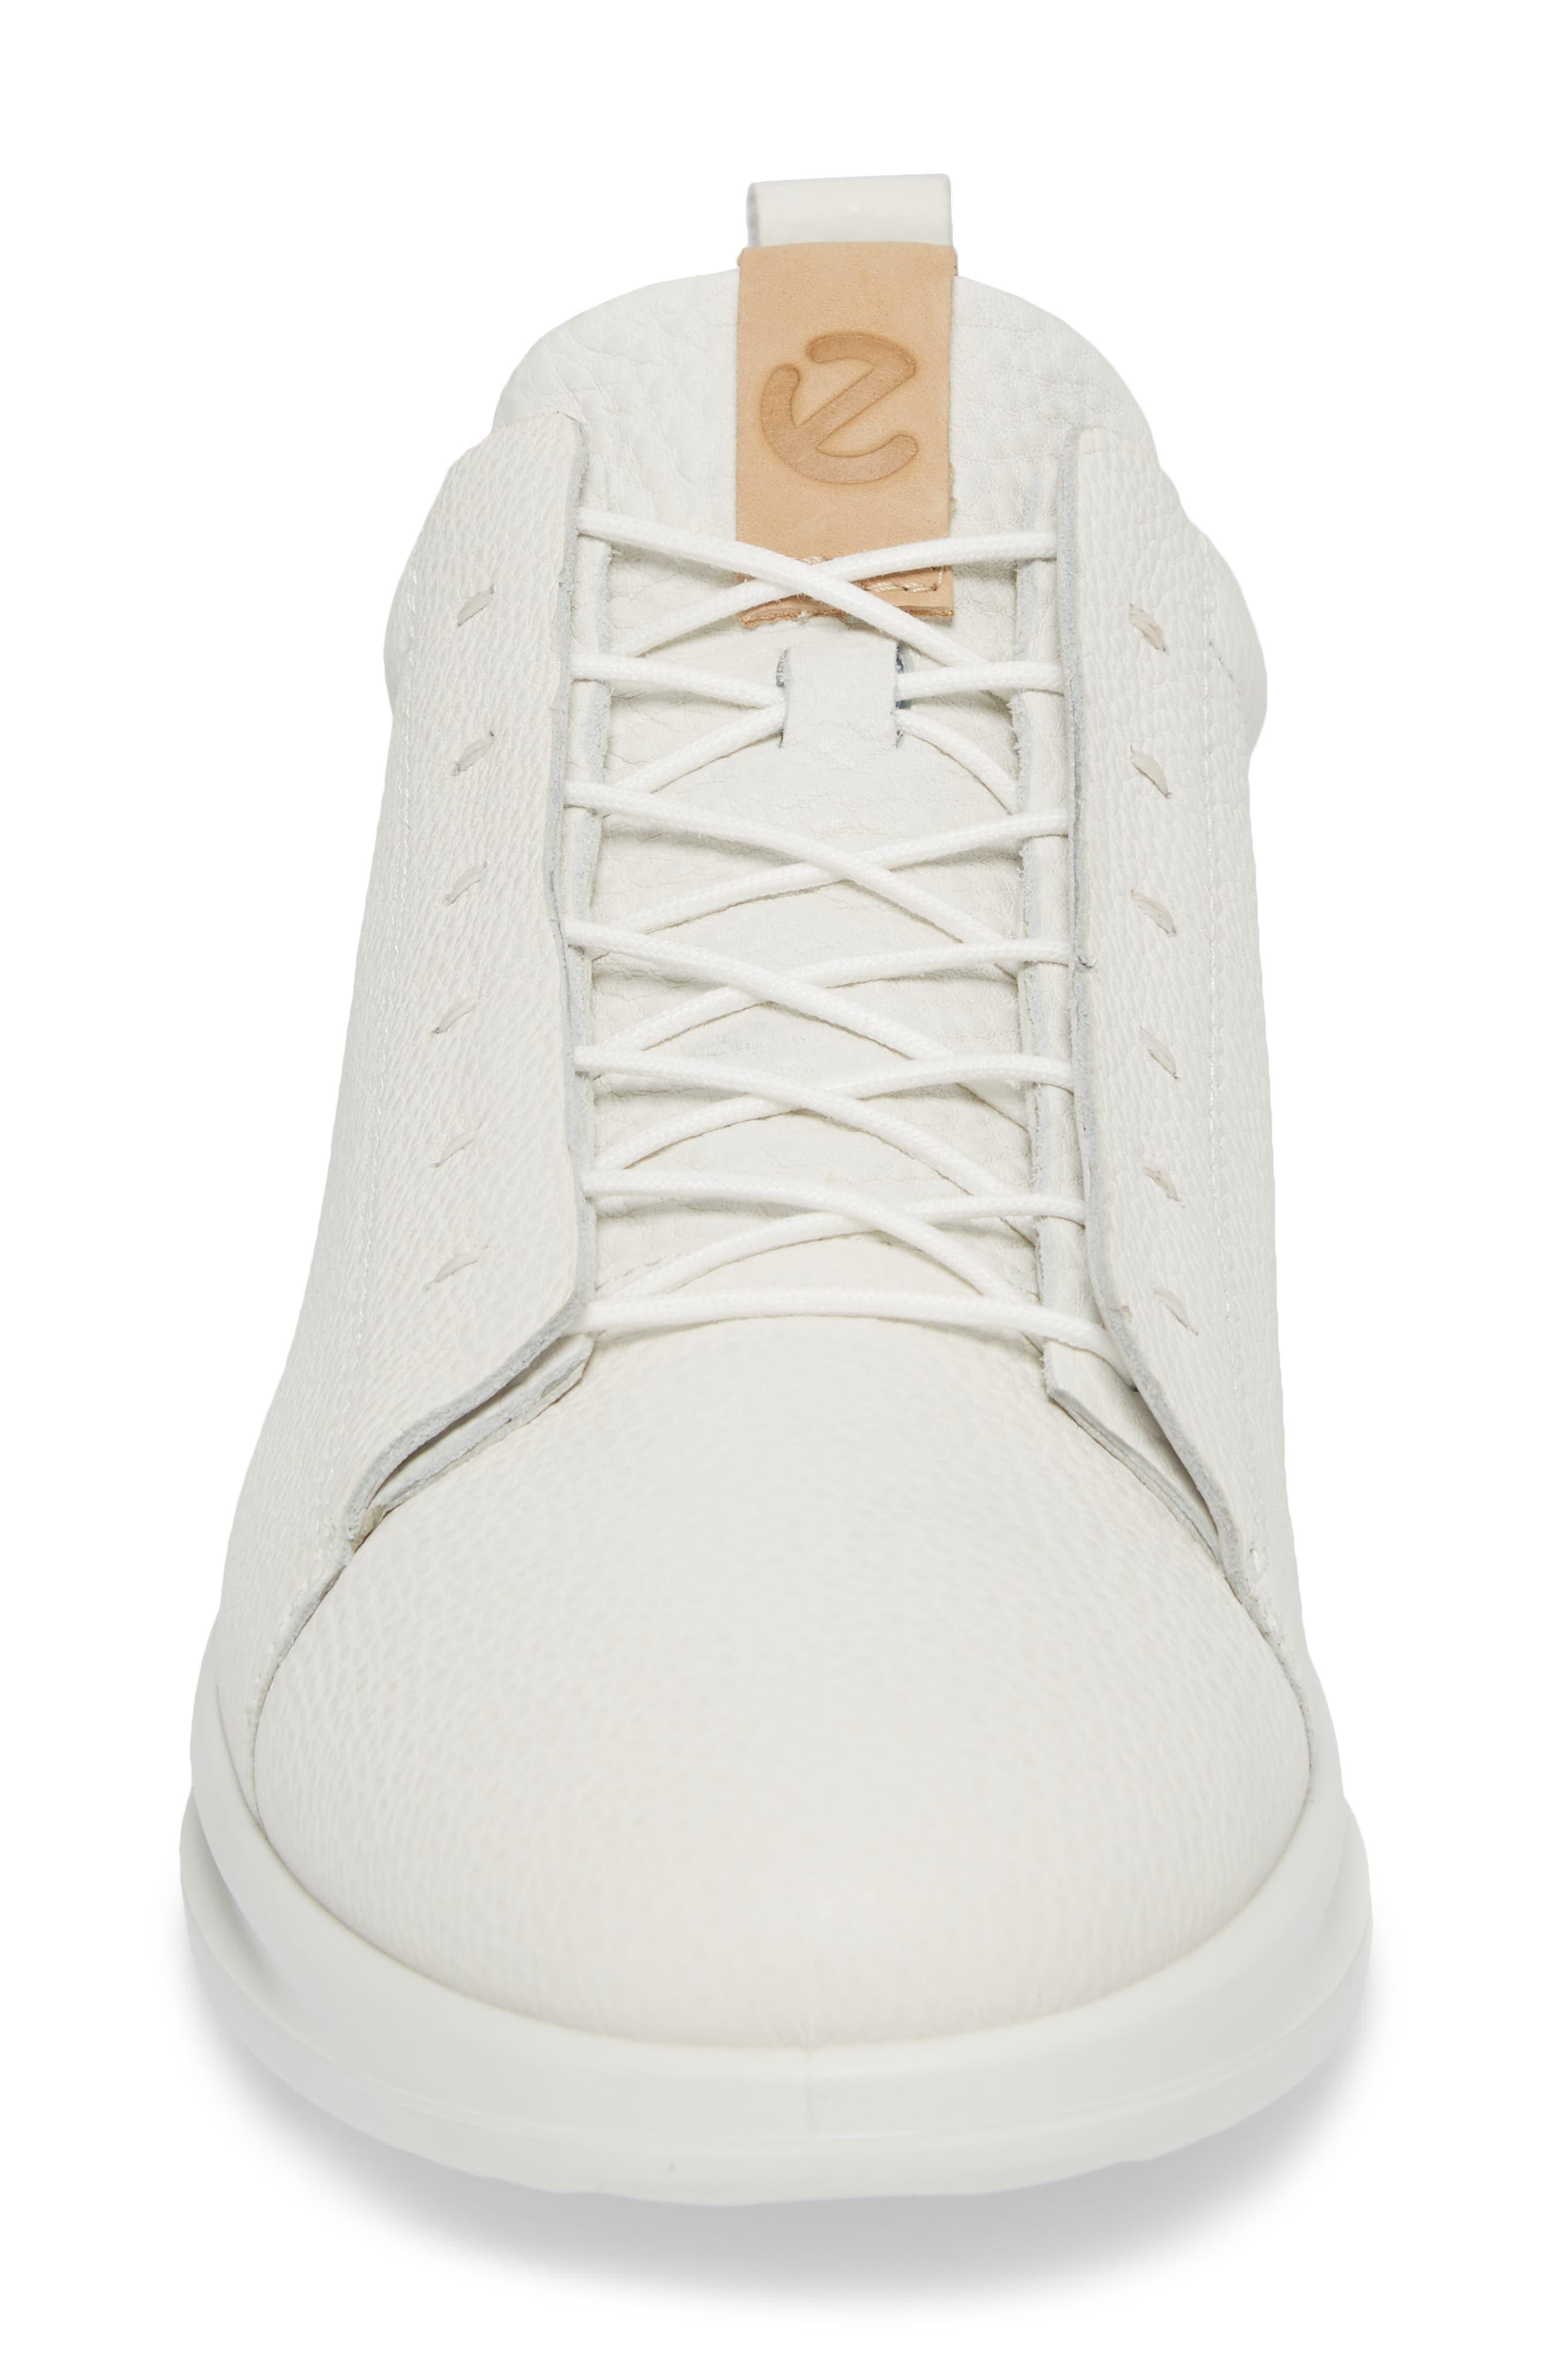 Aquet Low Top Sneaker,                             Alternate thumbnail 4, color,                             White Leather